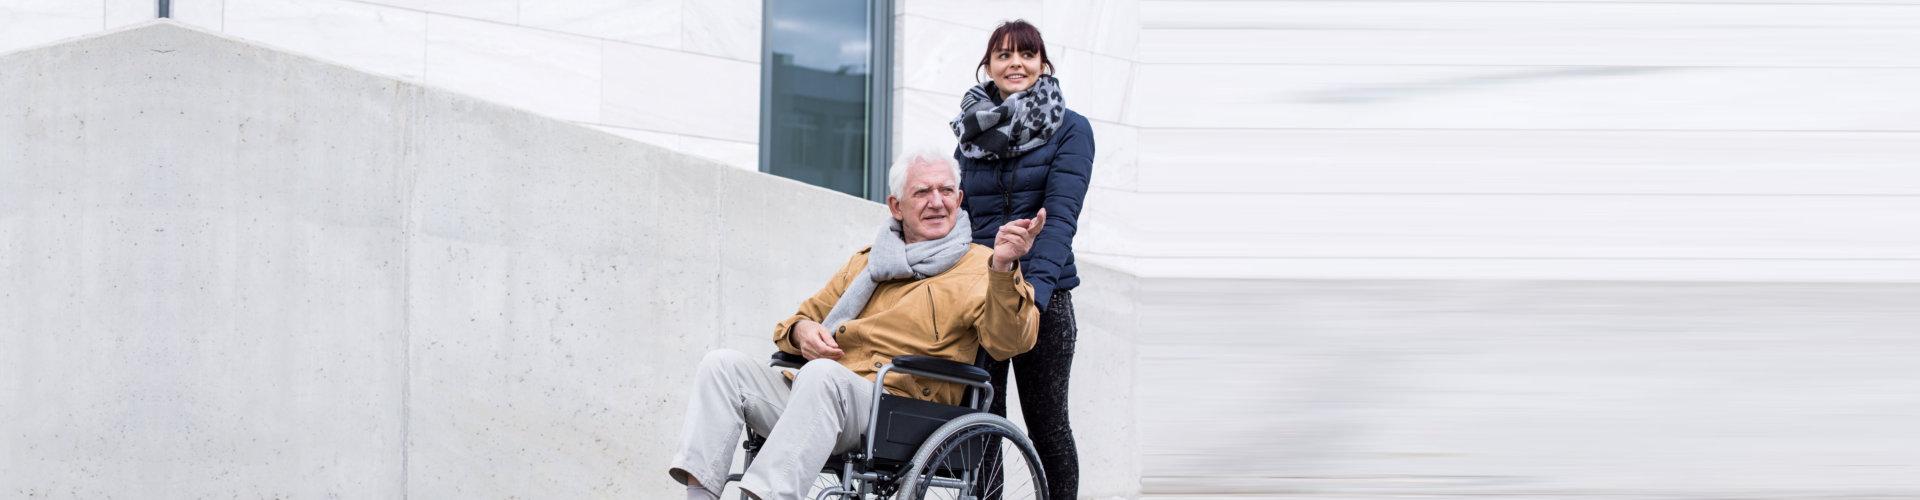 woman guiding old man